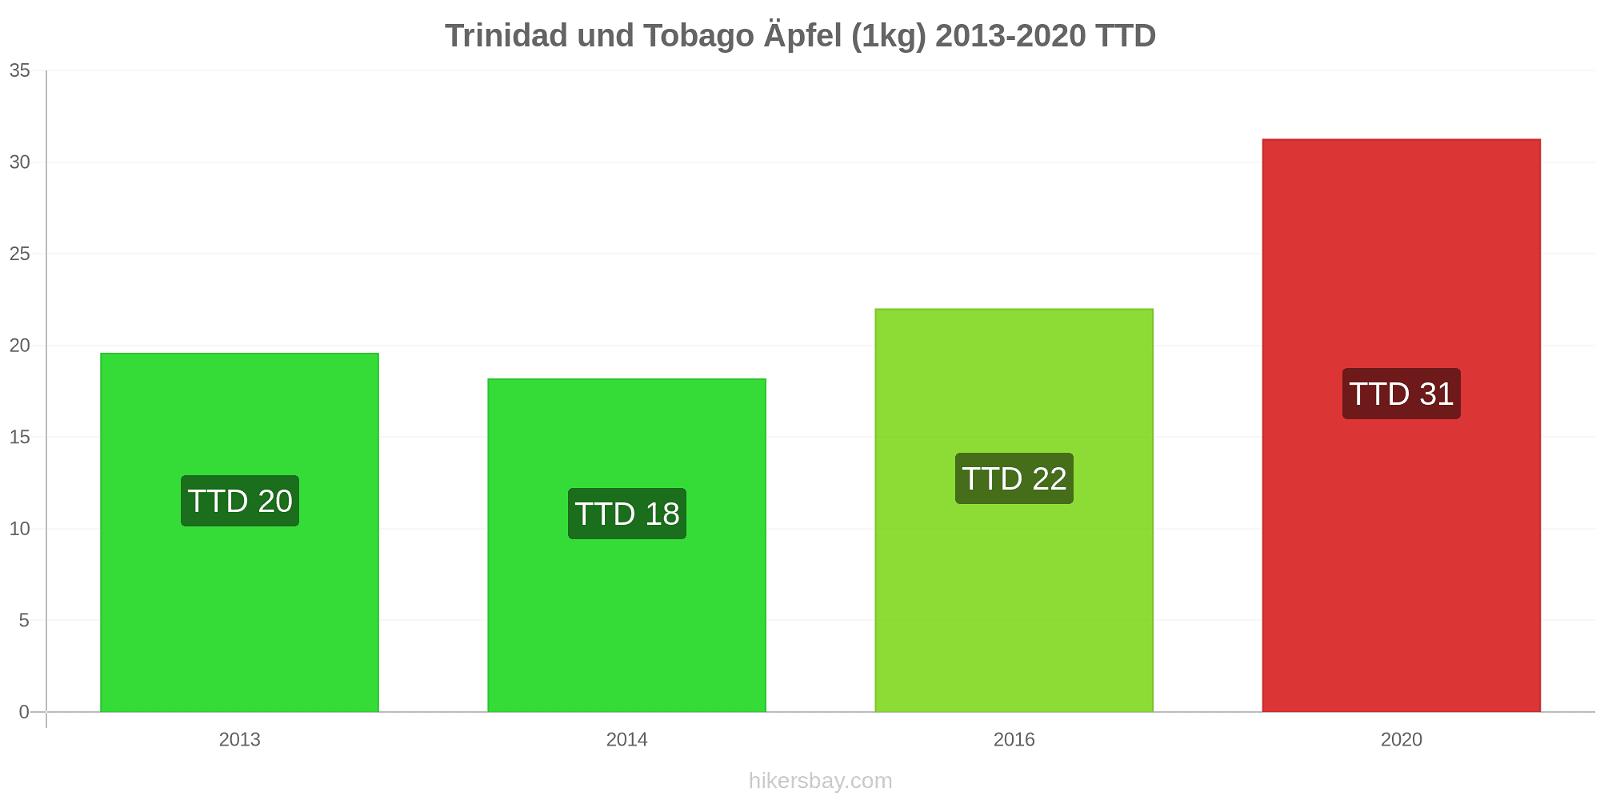 Trinidad und Tobago Preisänderungen Äpfel (1kg) hikersbay.com